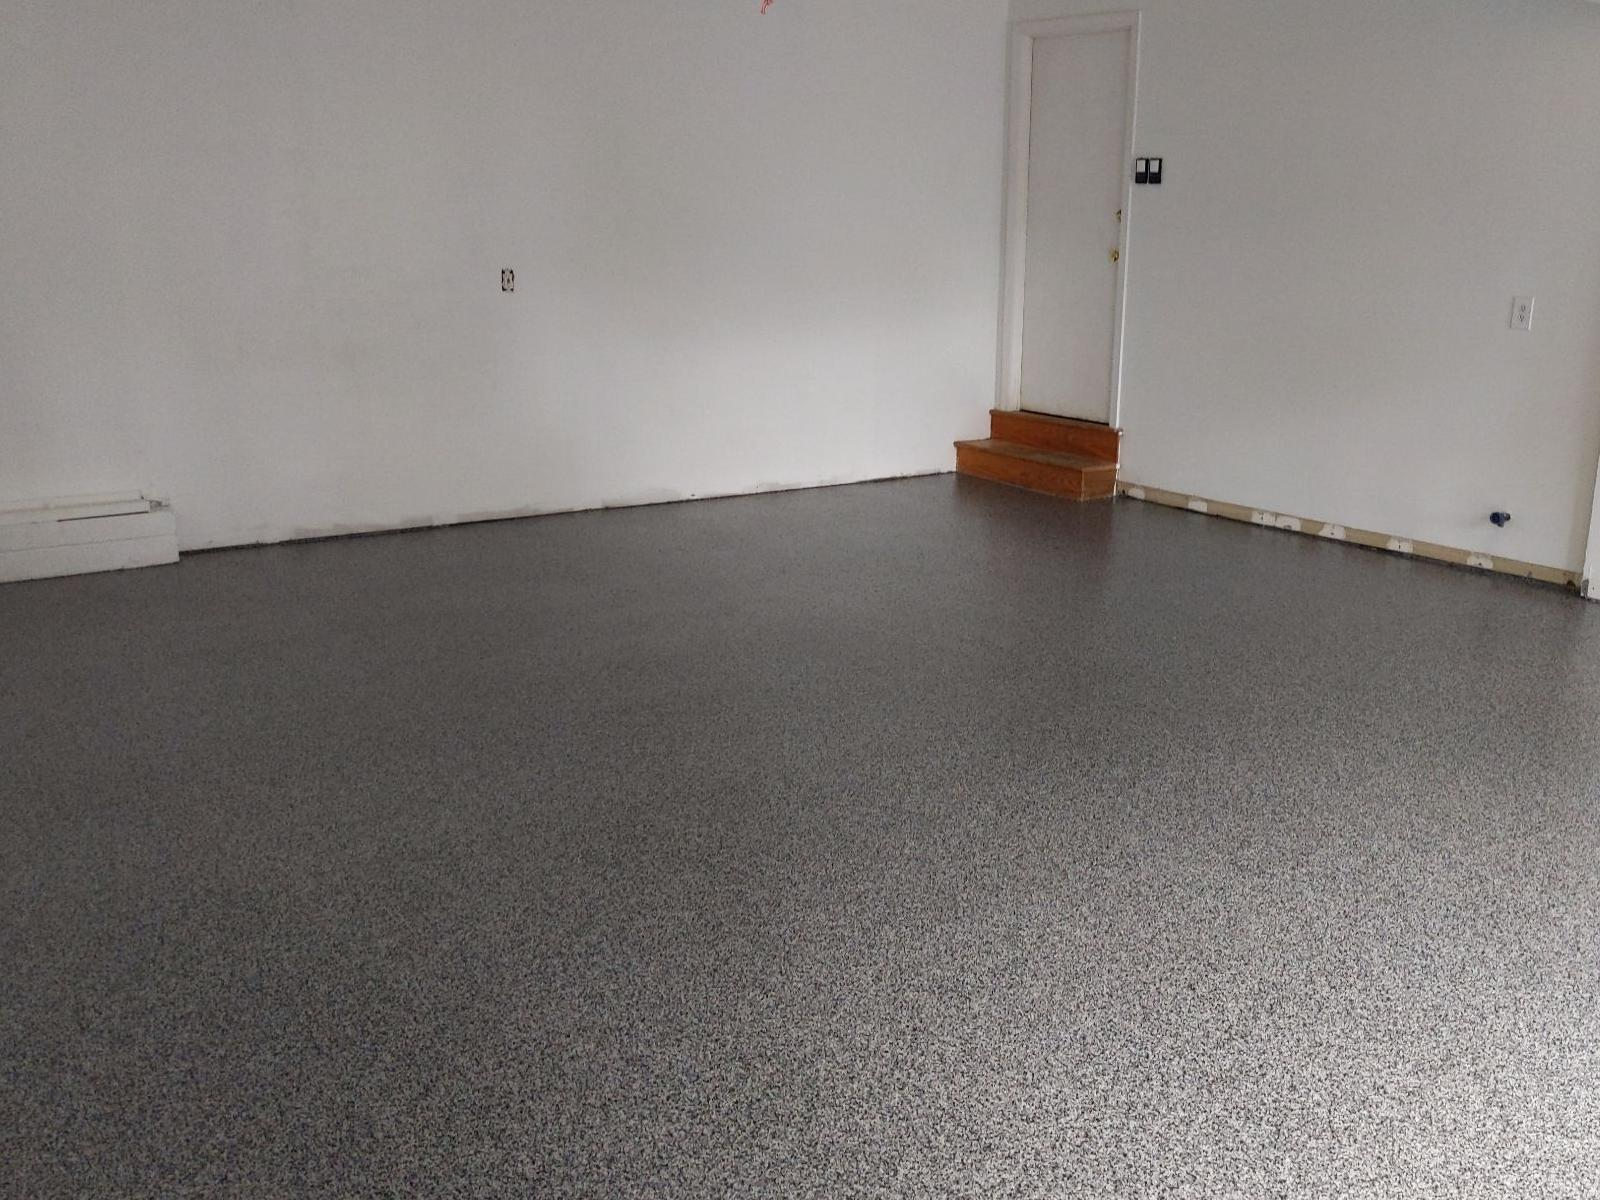 Garage Floor Coating in Bel Air, MD - After Photo